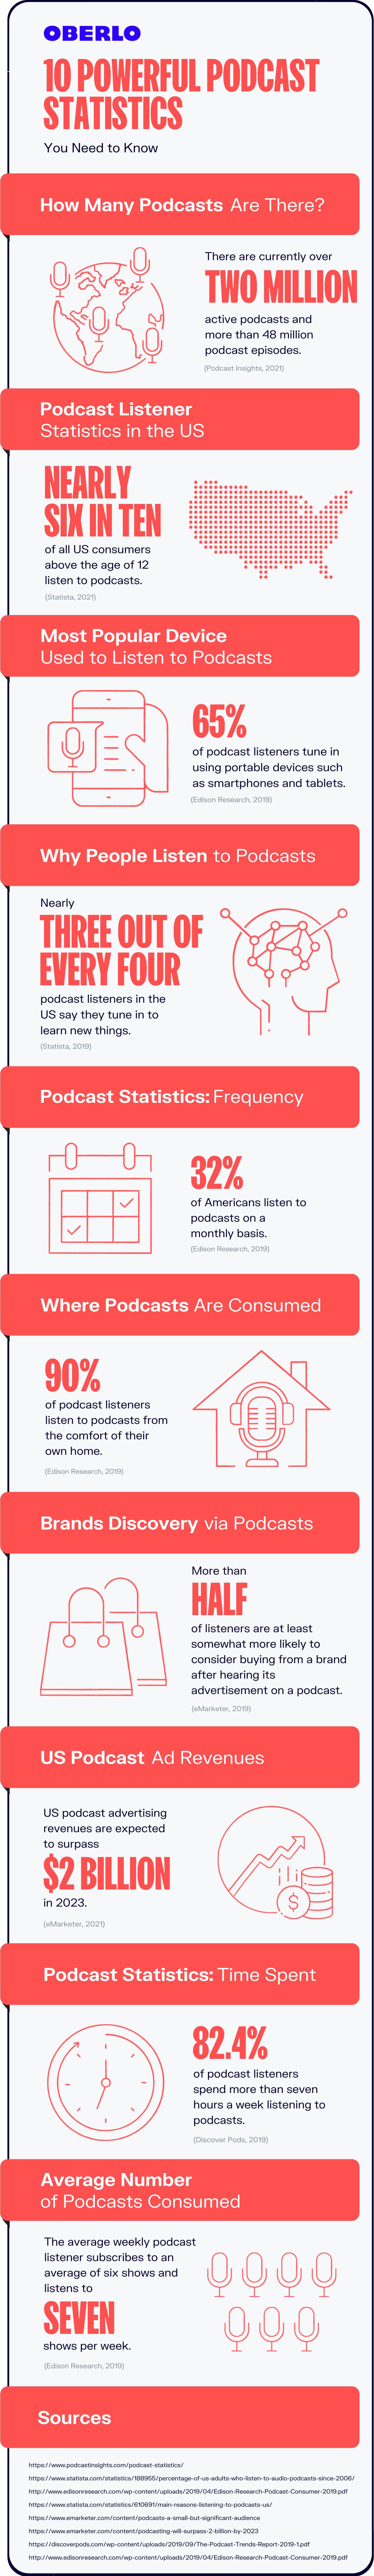 podcast statistics full graphic